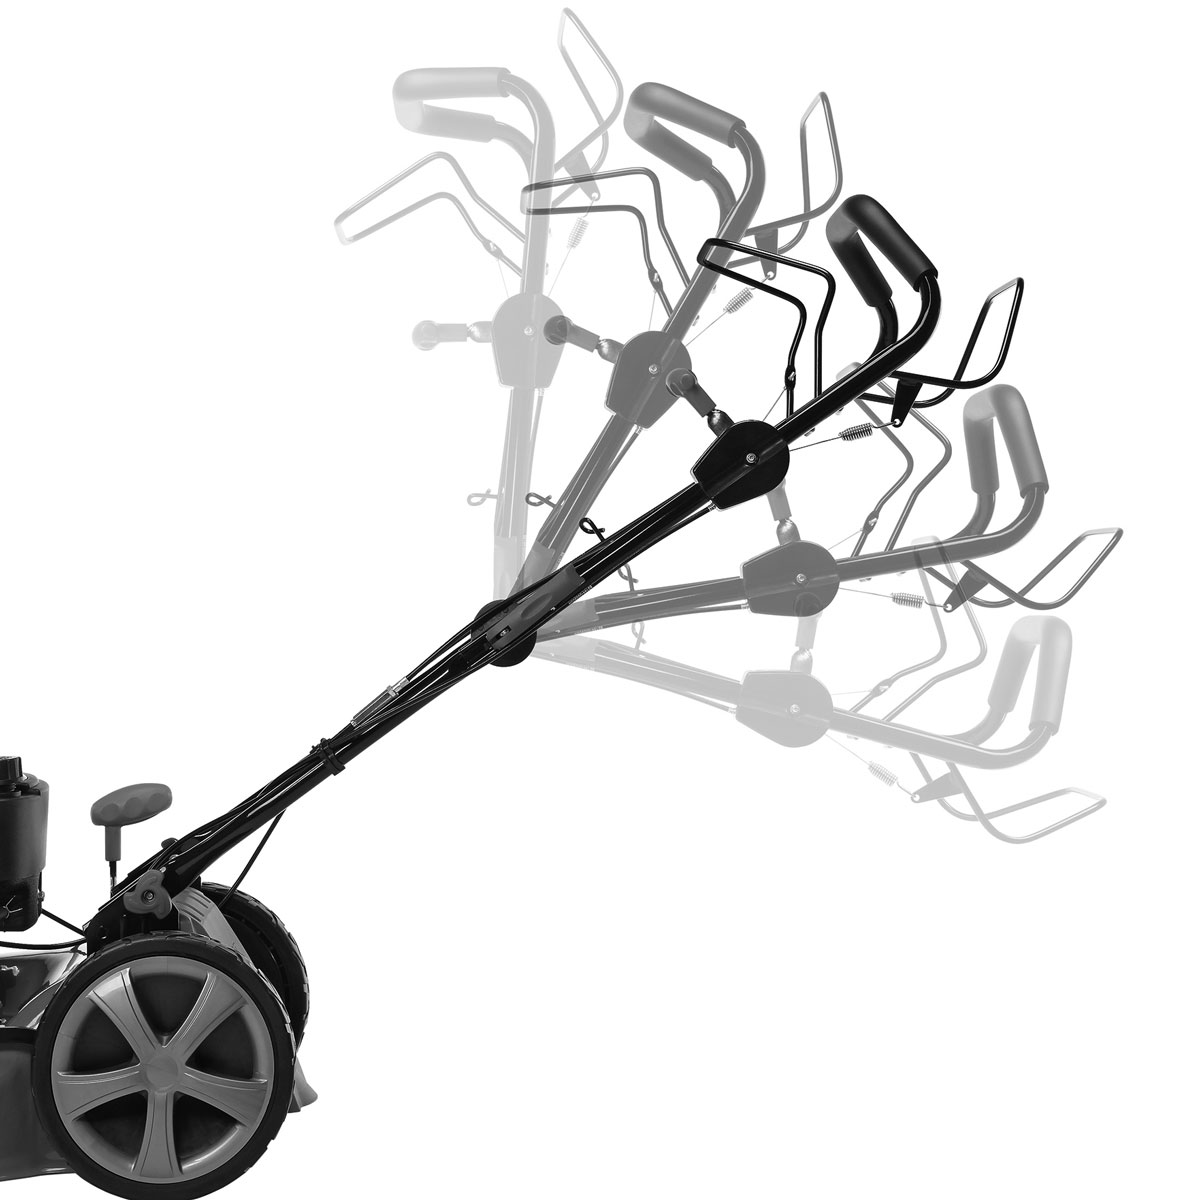 briggs stratton 4 in 1 benzin rasenm her mit selbstantrieb motorm her b s bs. Black Bedroom Furniture Sets. Home Design Ideas